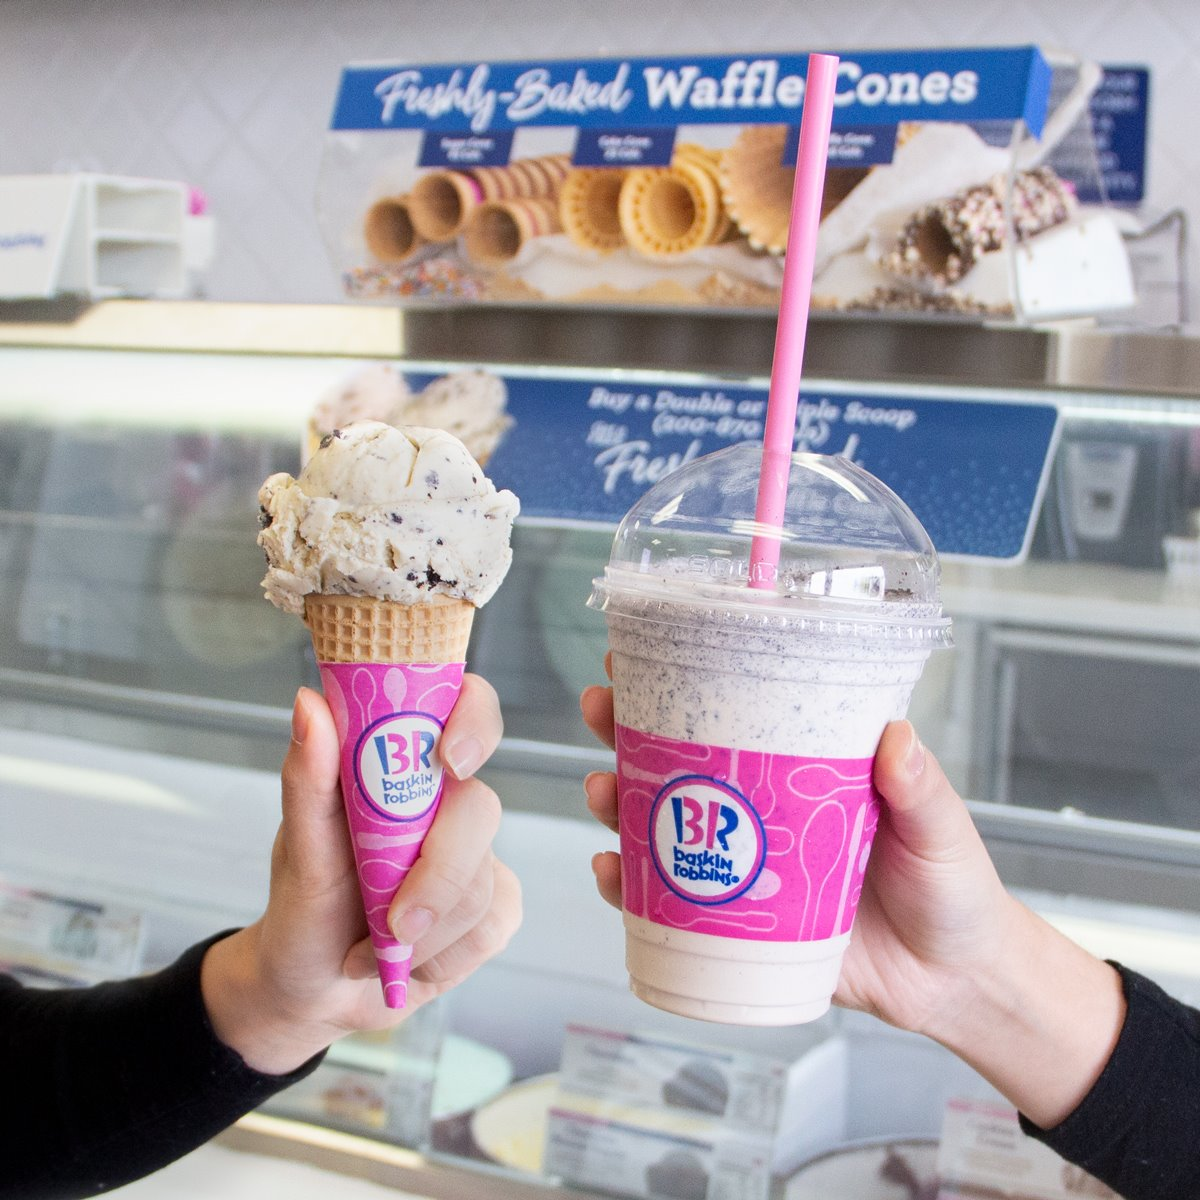 Photo: Baskin-Robbins Facebook